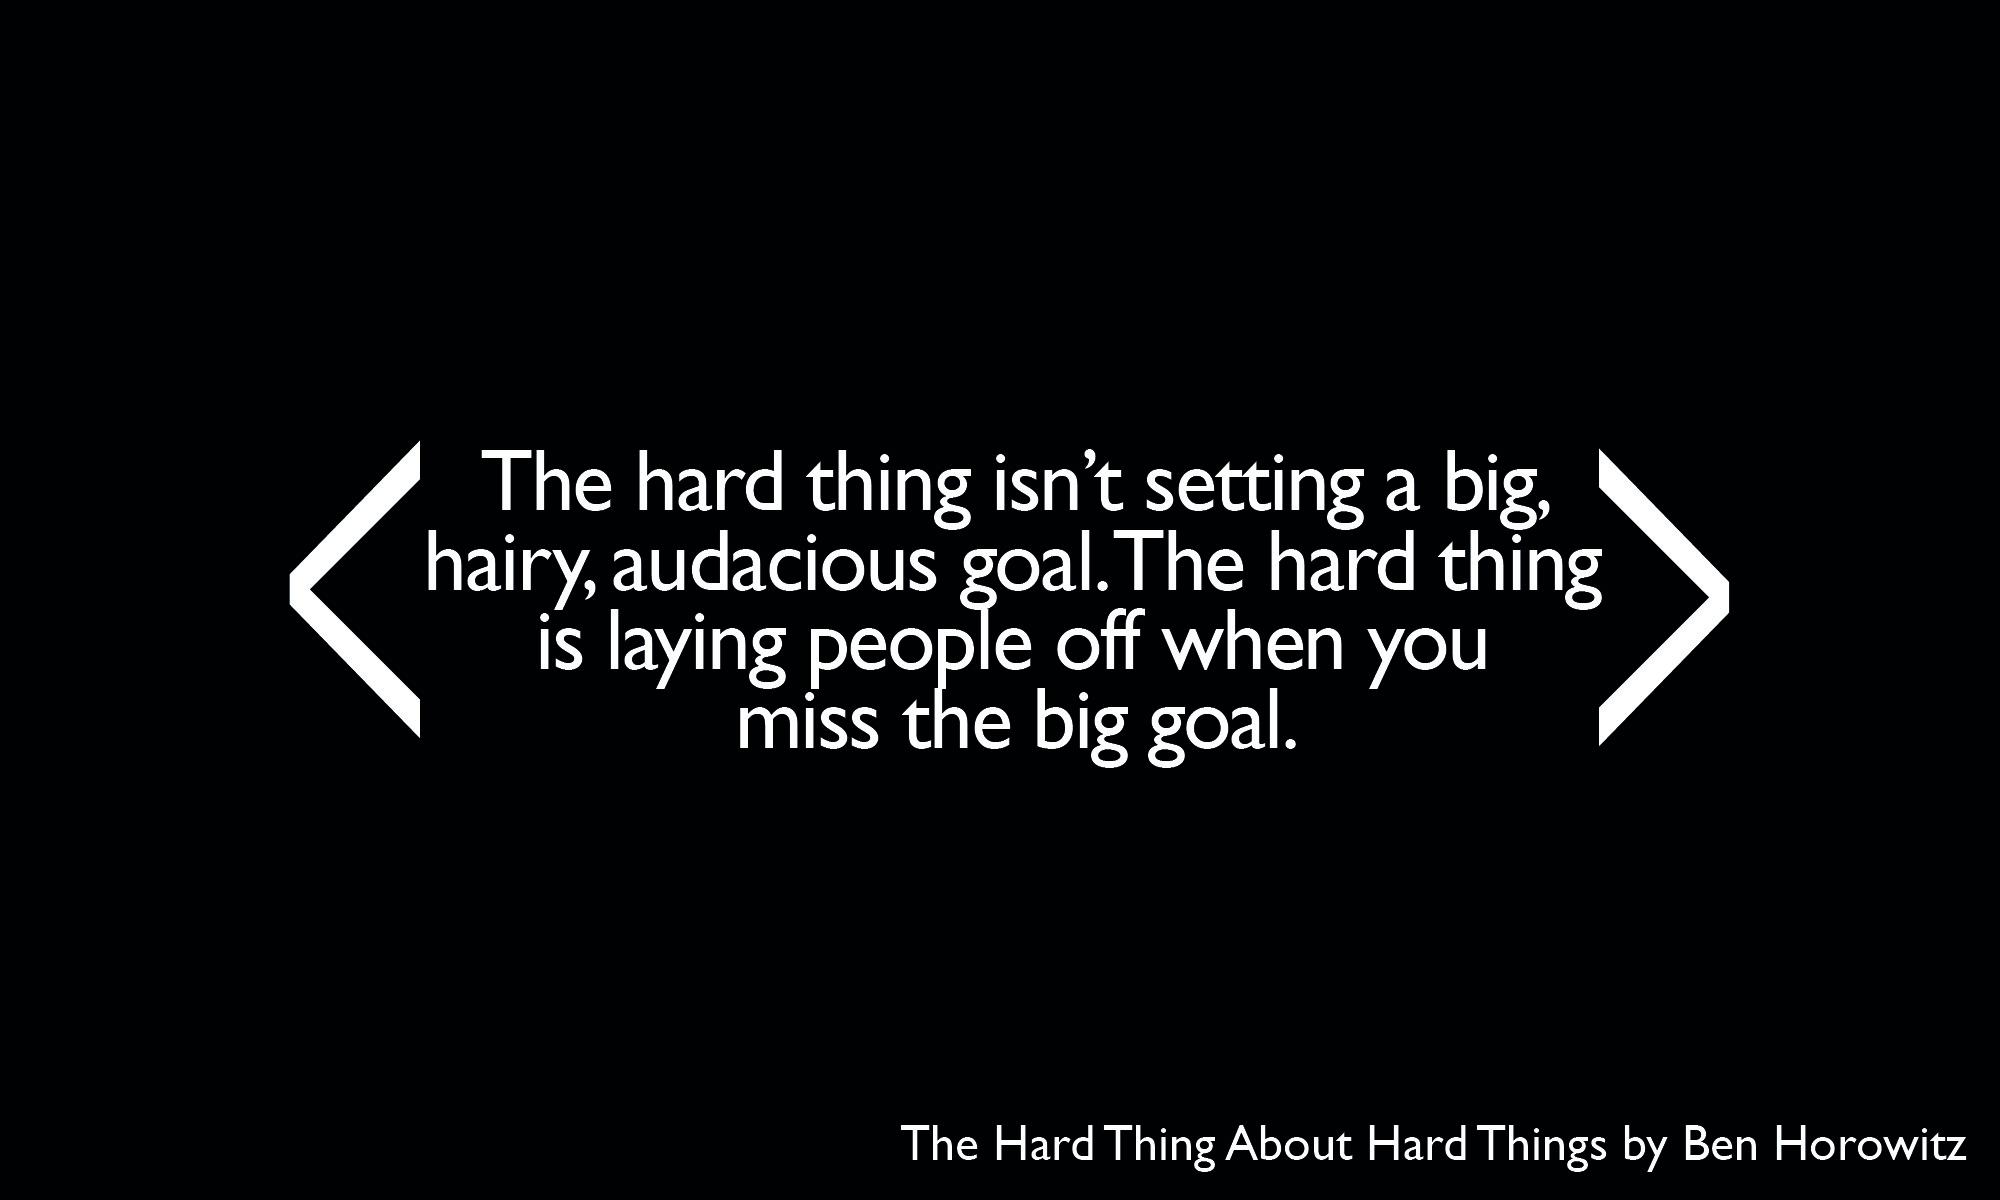 The hard thing isn't setting big hairy audacious goals